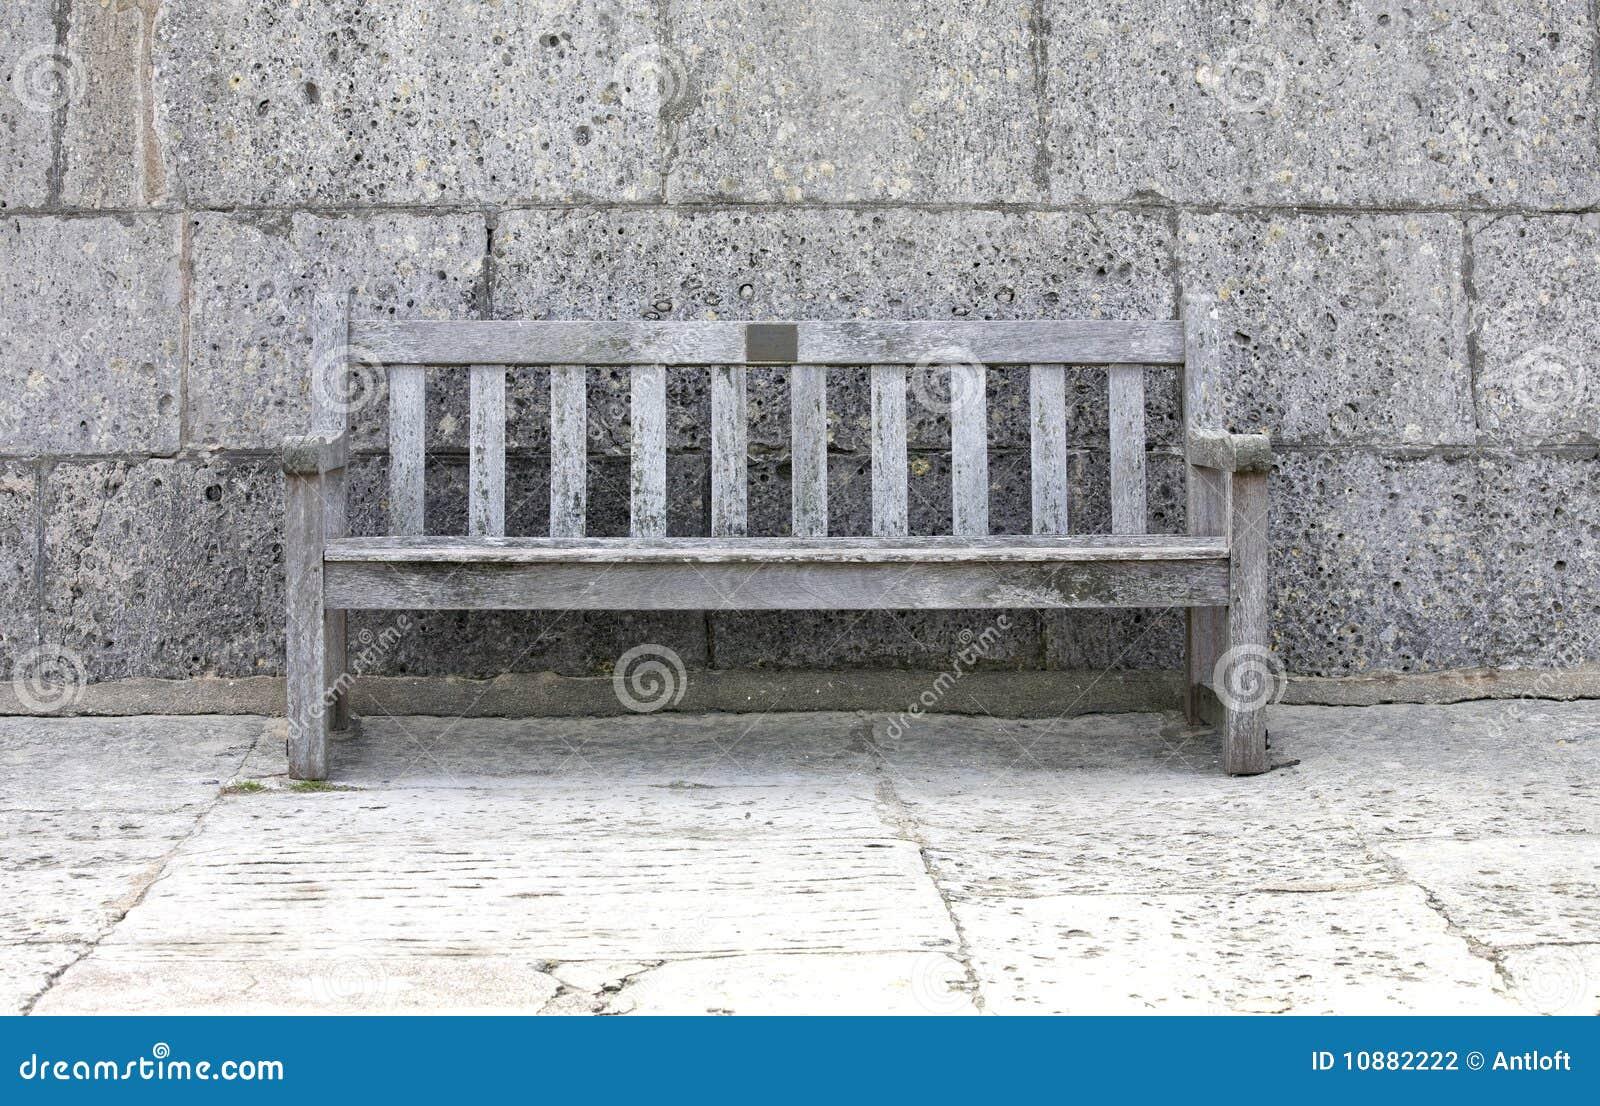 banc gris photographie stock image 10882222. Black Bedroom Furniture Sets. Home Design Ideas